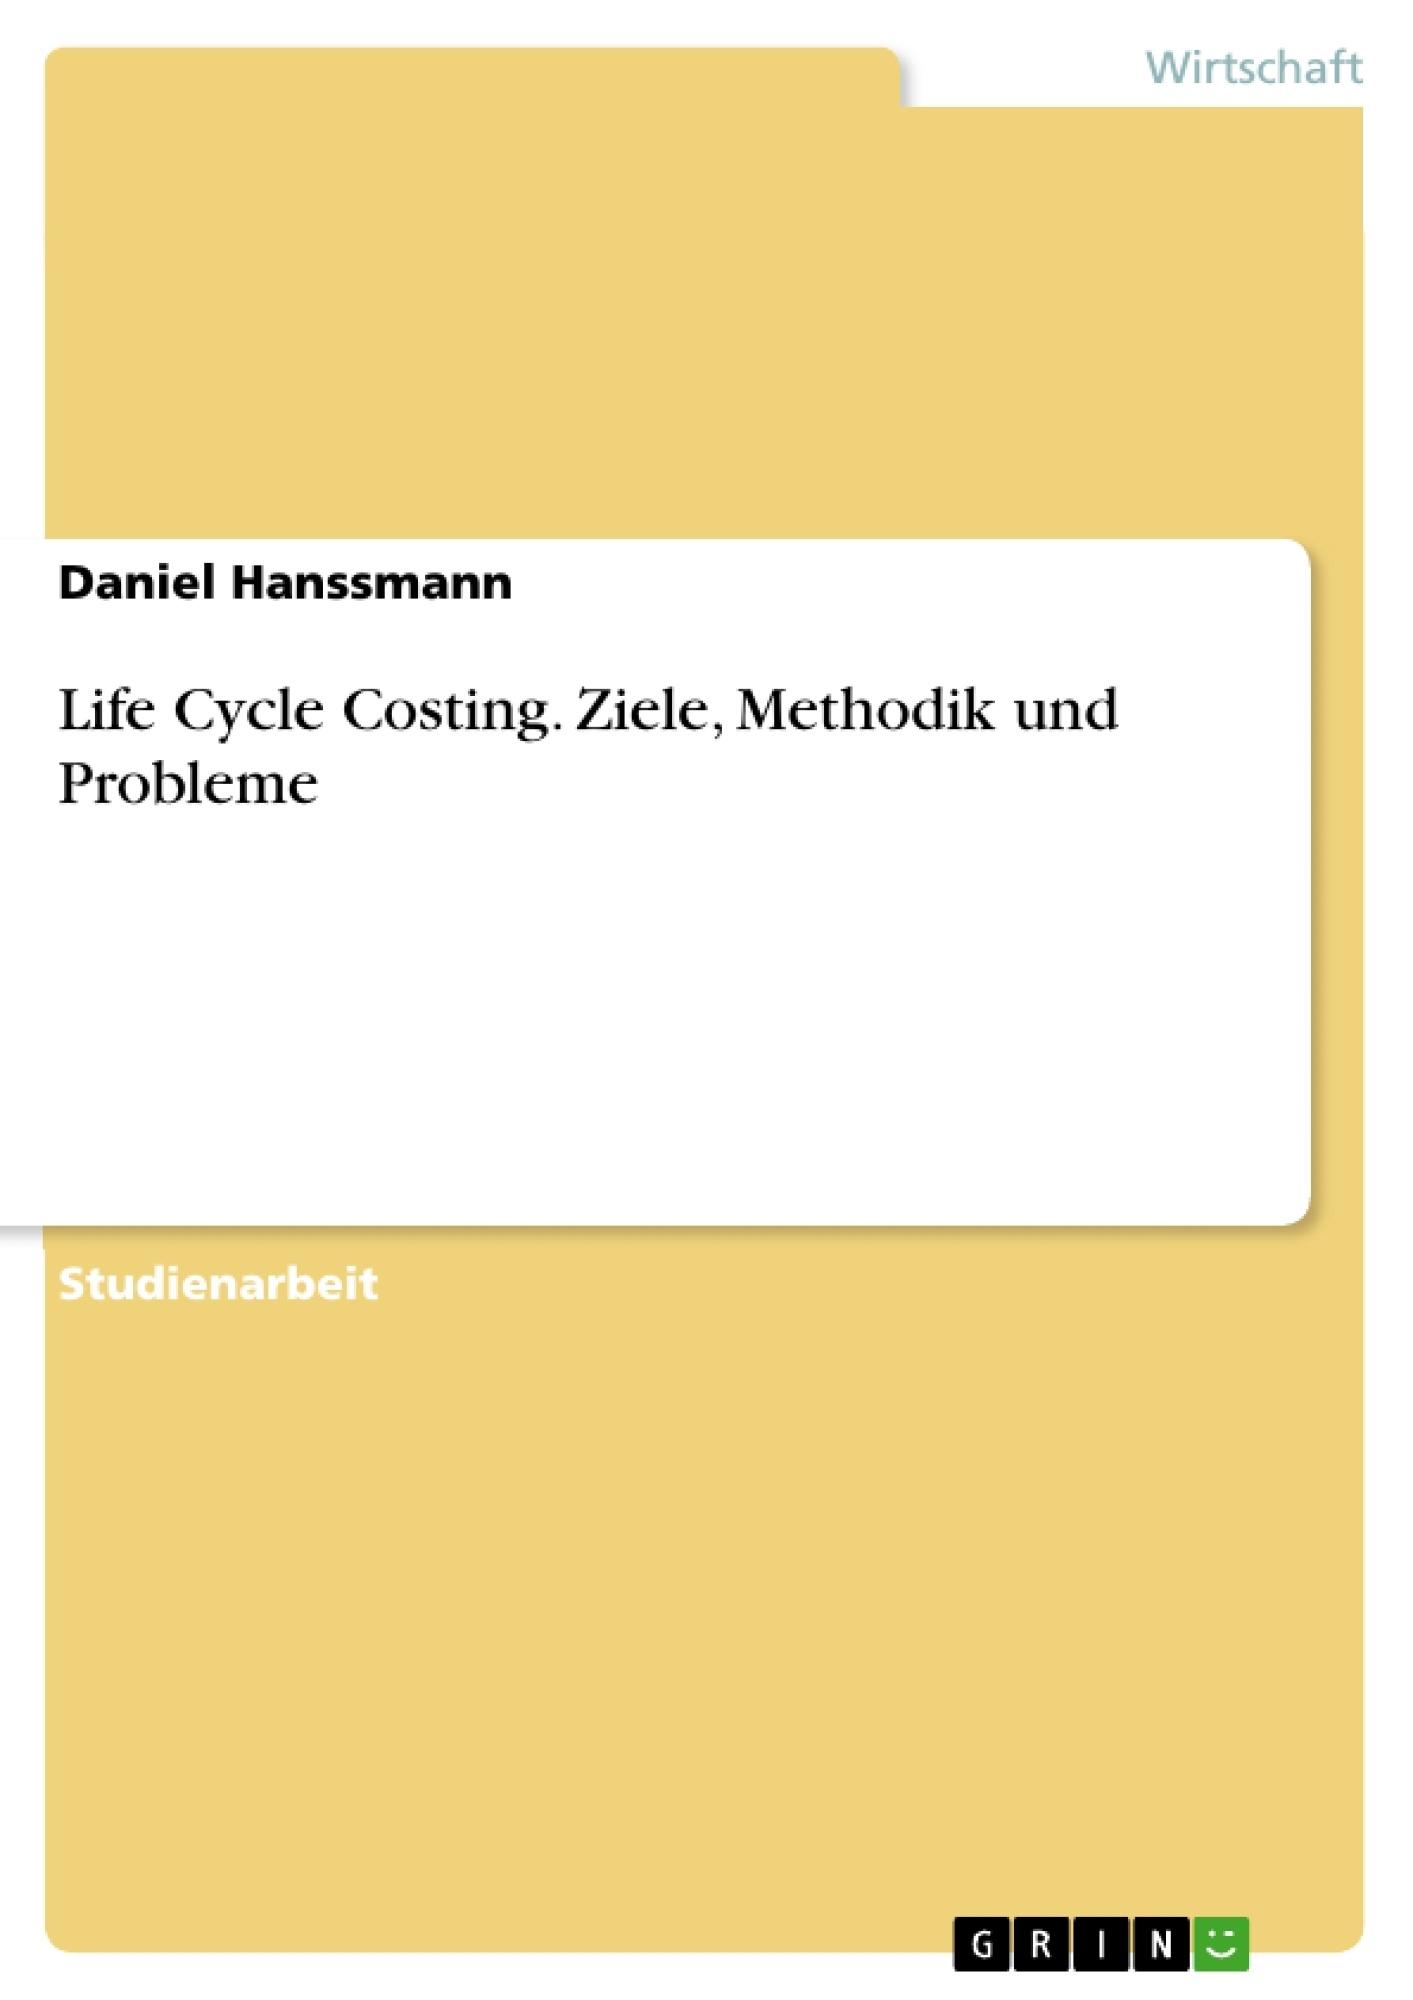 Titel: Life Cycle Costing. Ziele, Methodik und Probleme